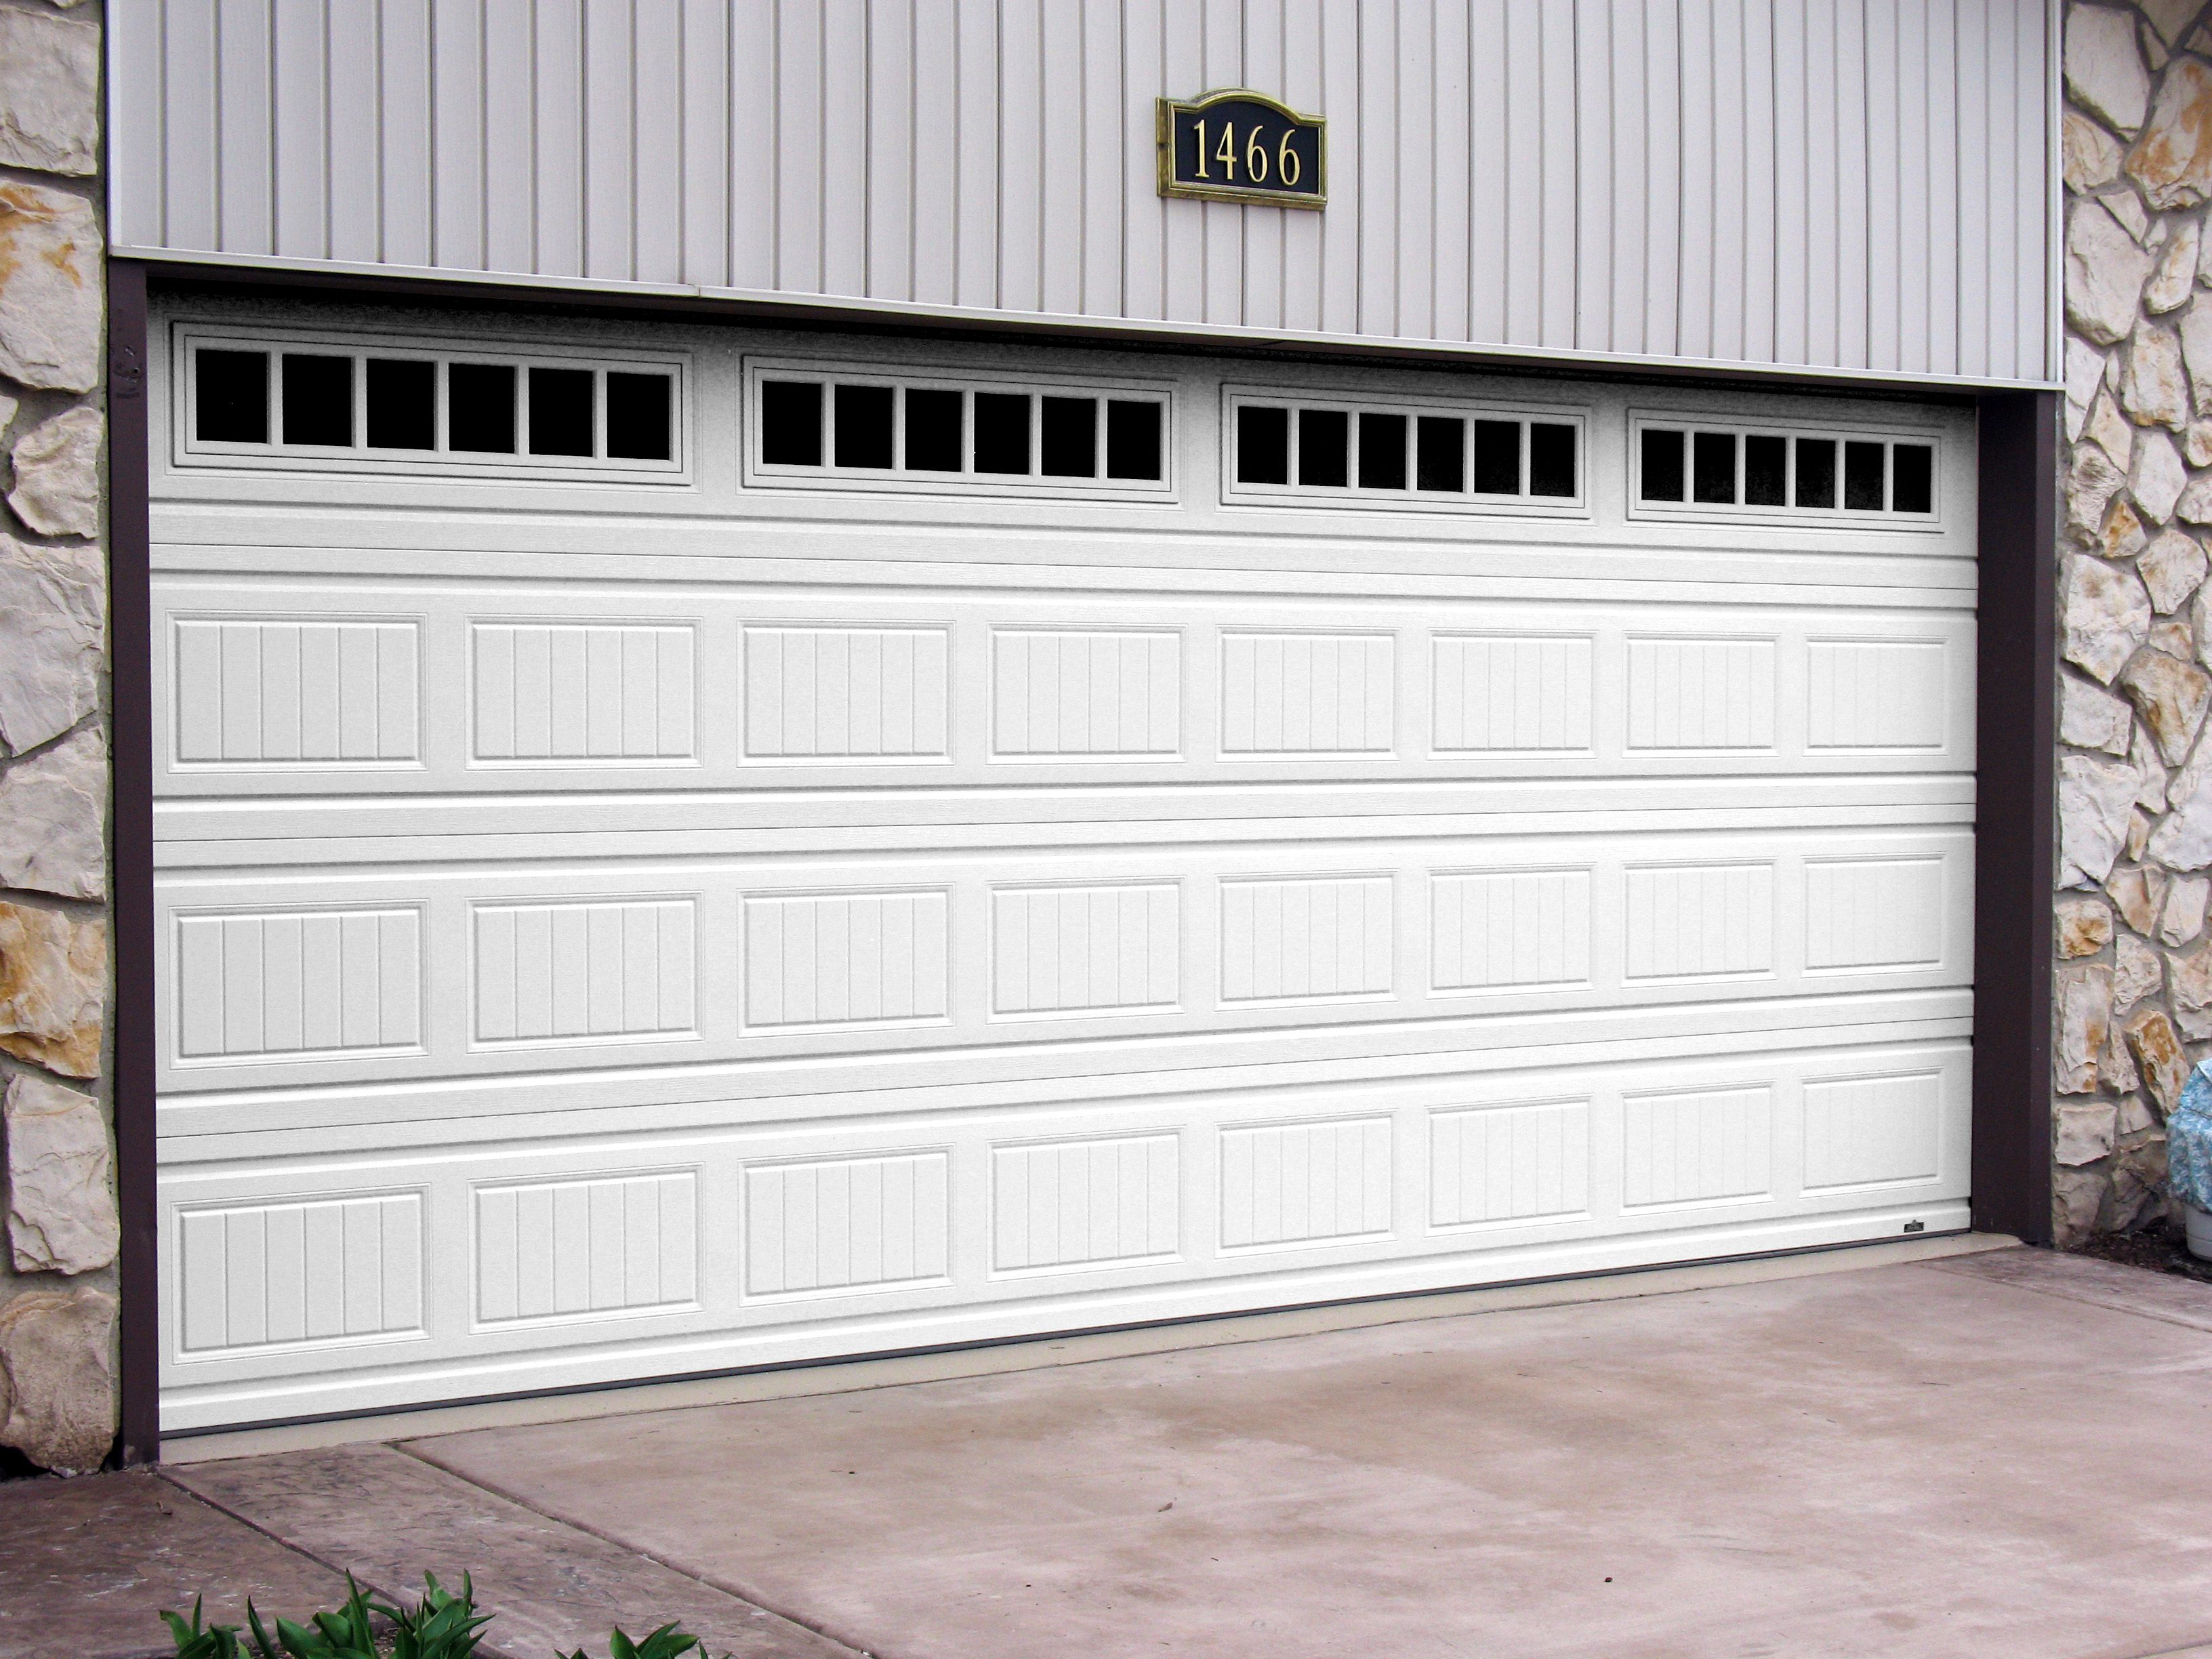 2448 #706149 Pin By Modern Garage Doors USA On Phoenix Garage Doors Pinterest image Usa Garage Doors 36133264